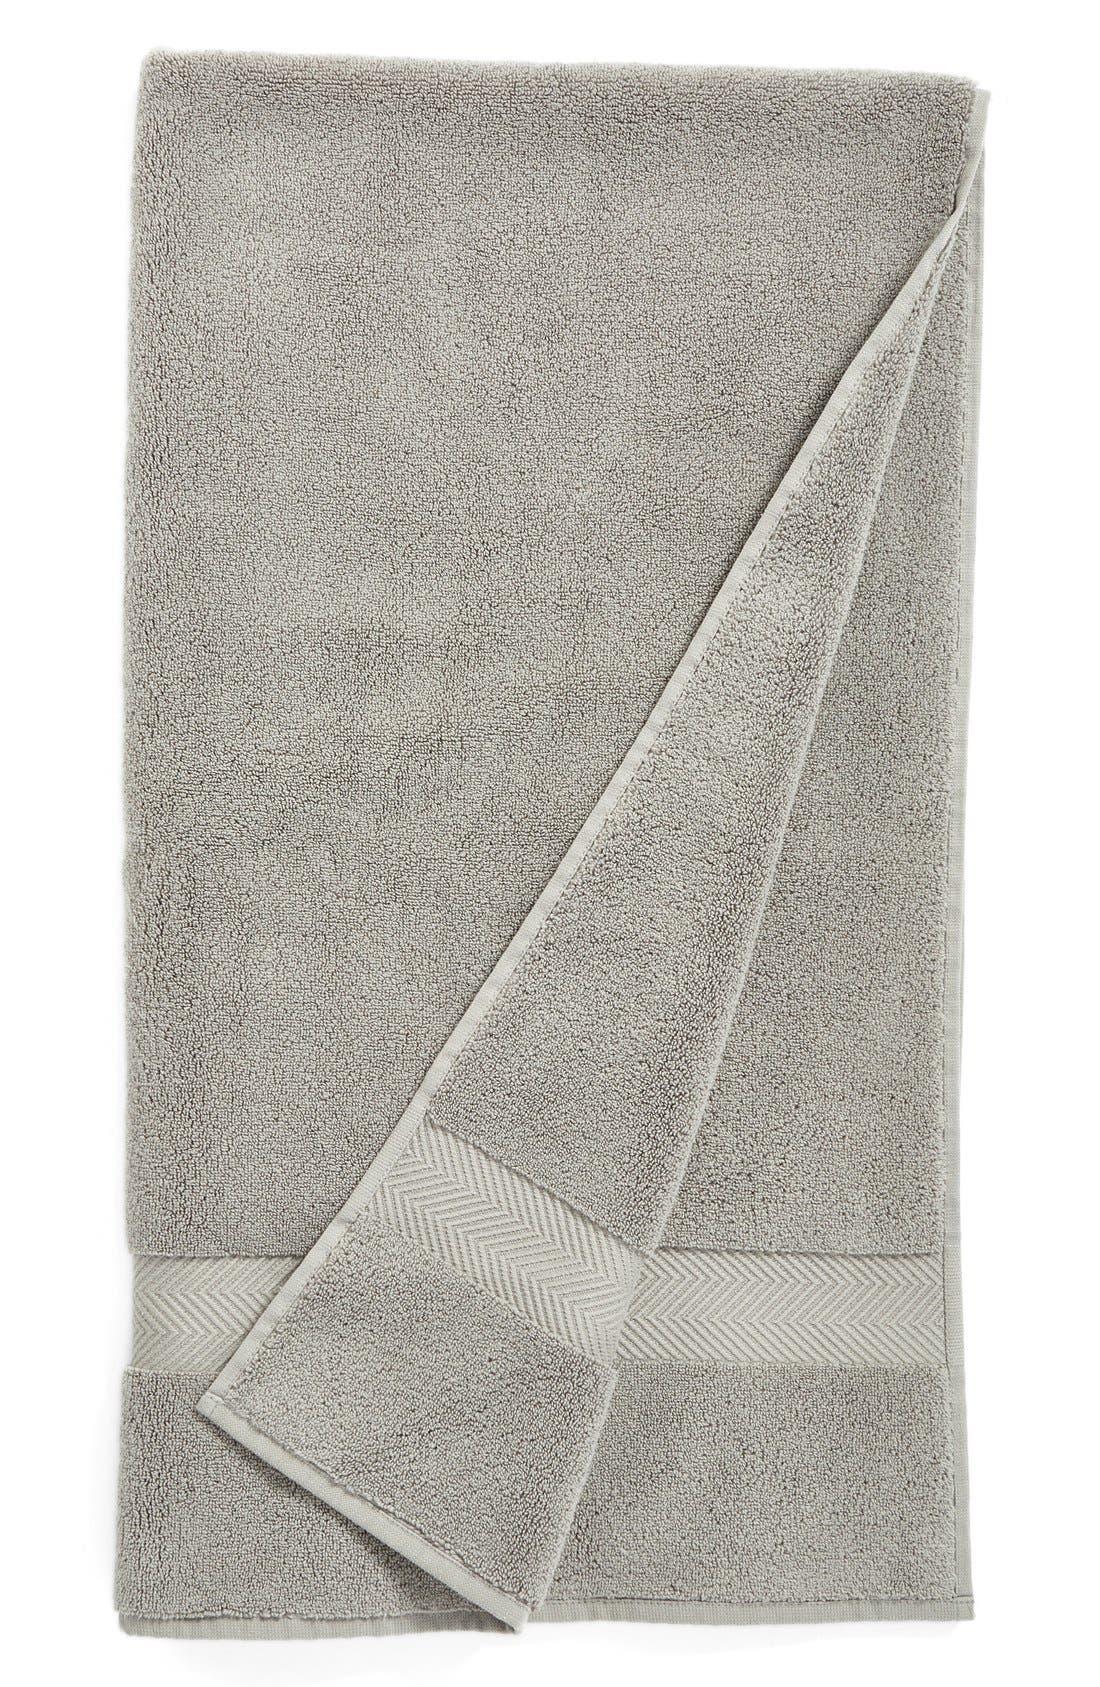 Hydrocotton Bath Towel,                         Main,                         color, GRAPHITE